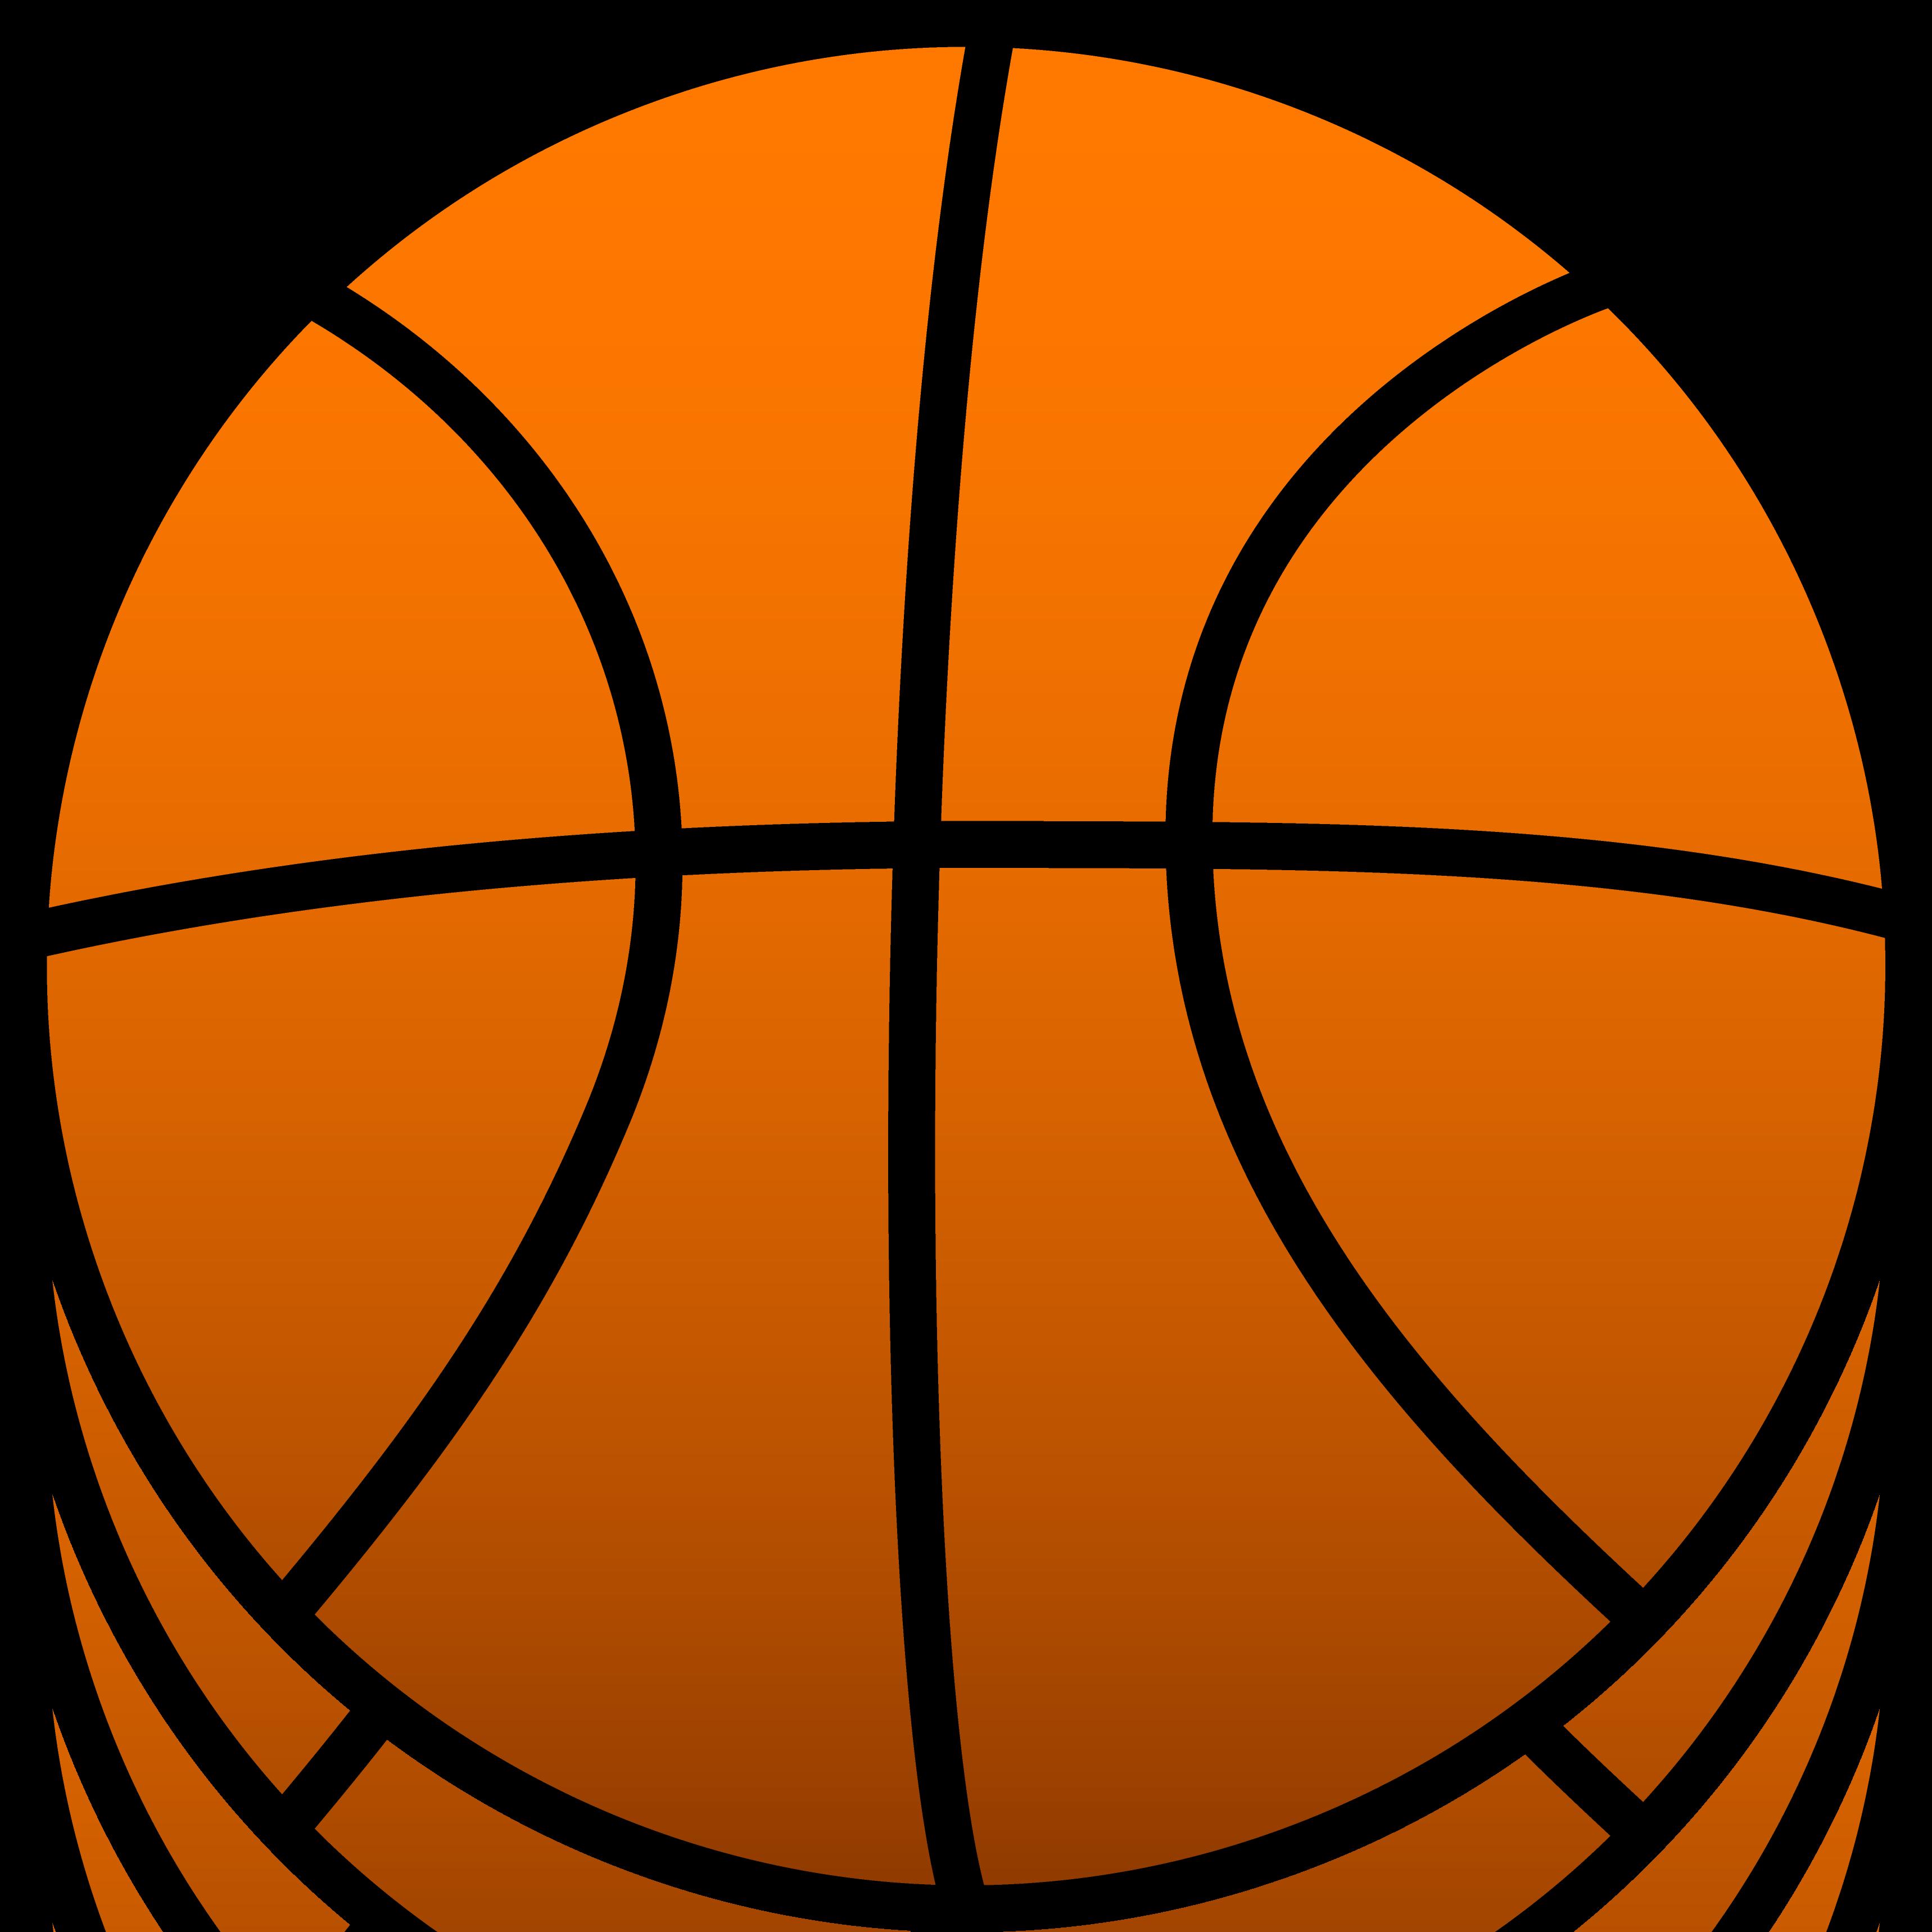 Clipart png basketball. Panda free images